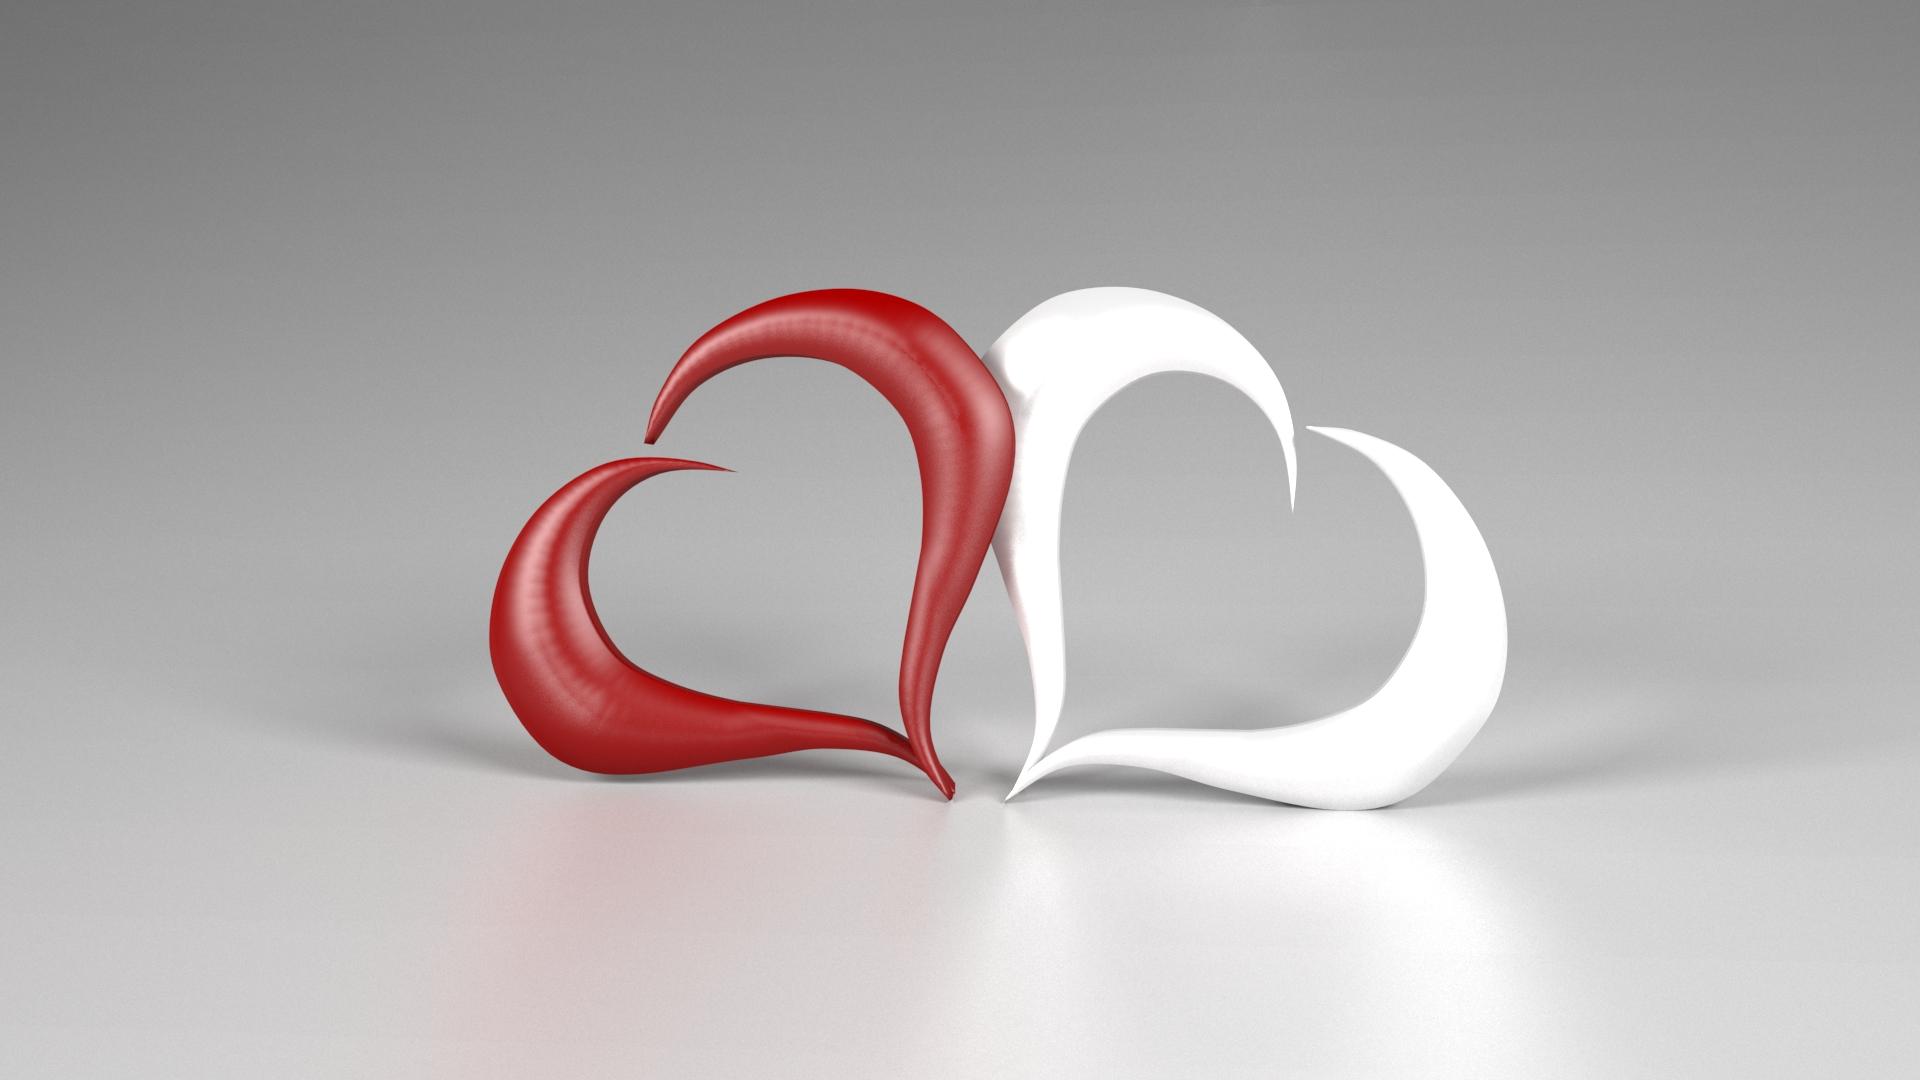 Love Heart Candy